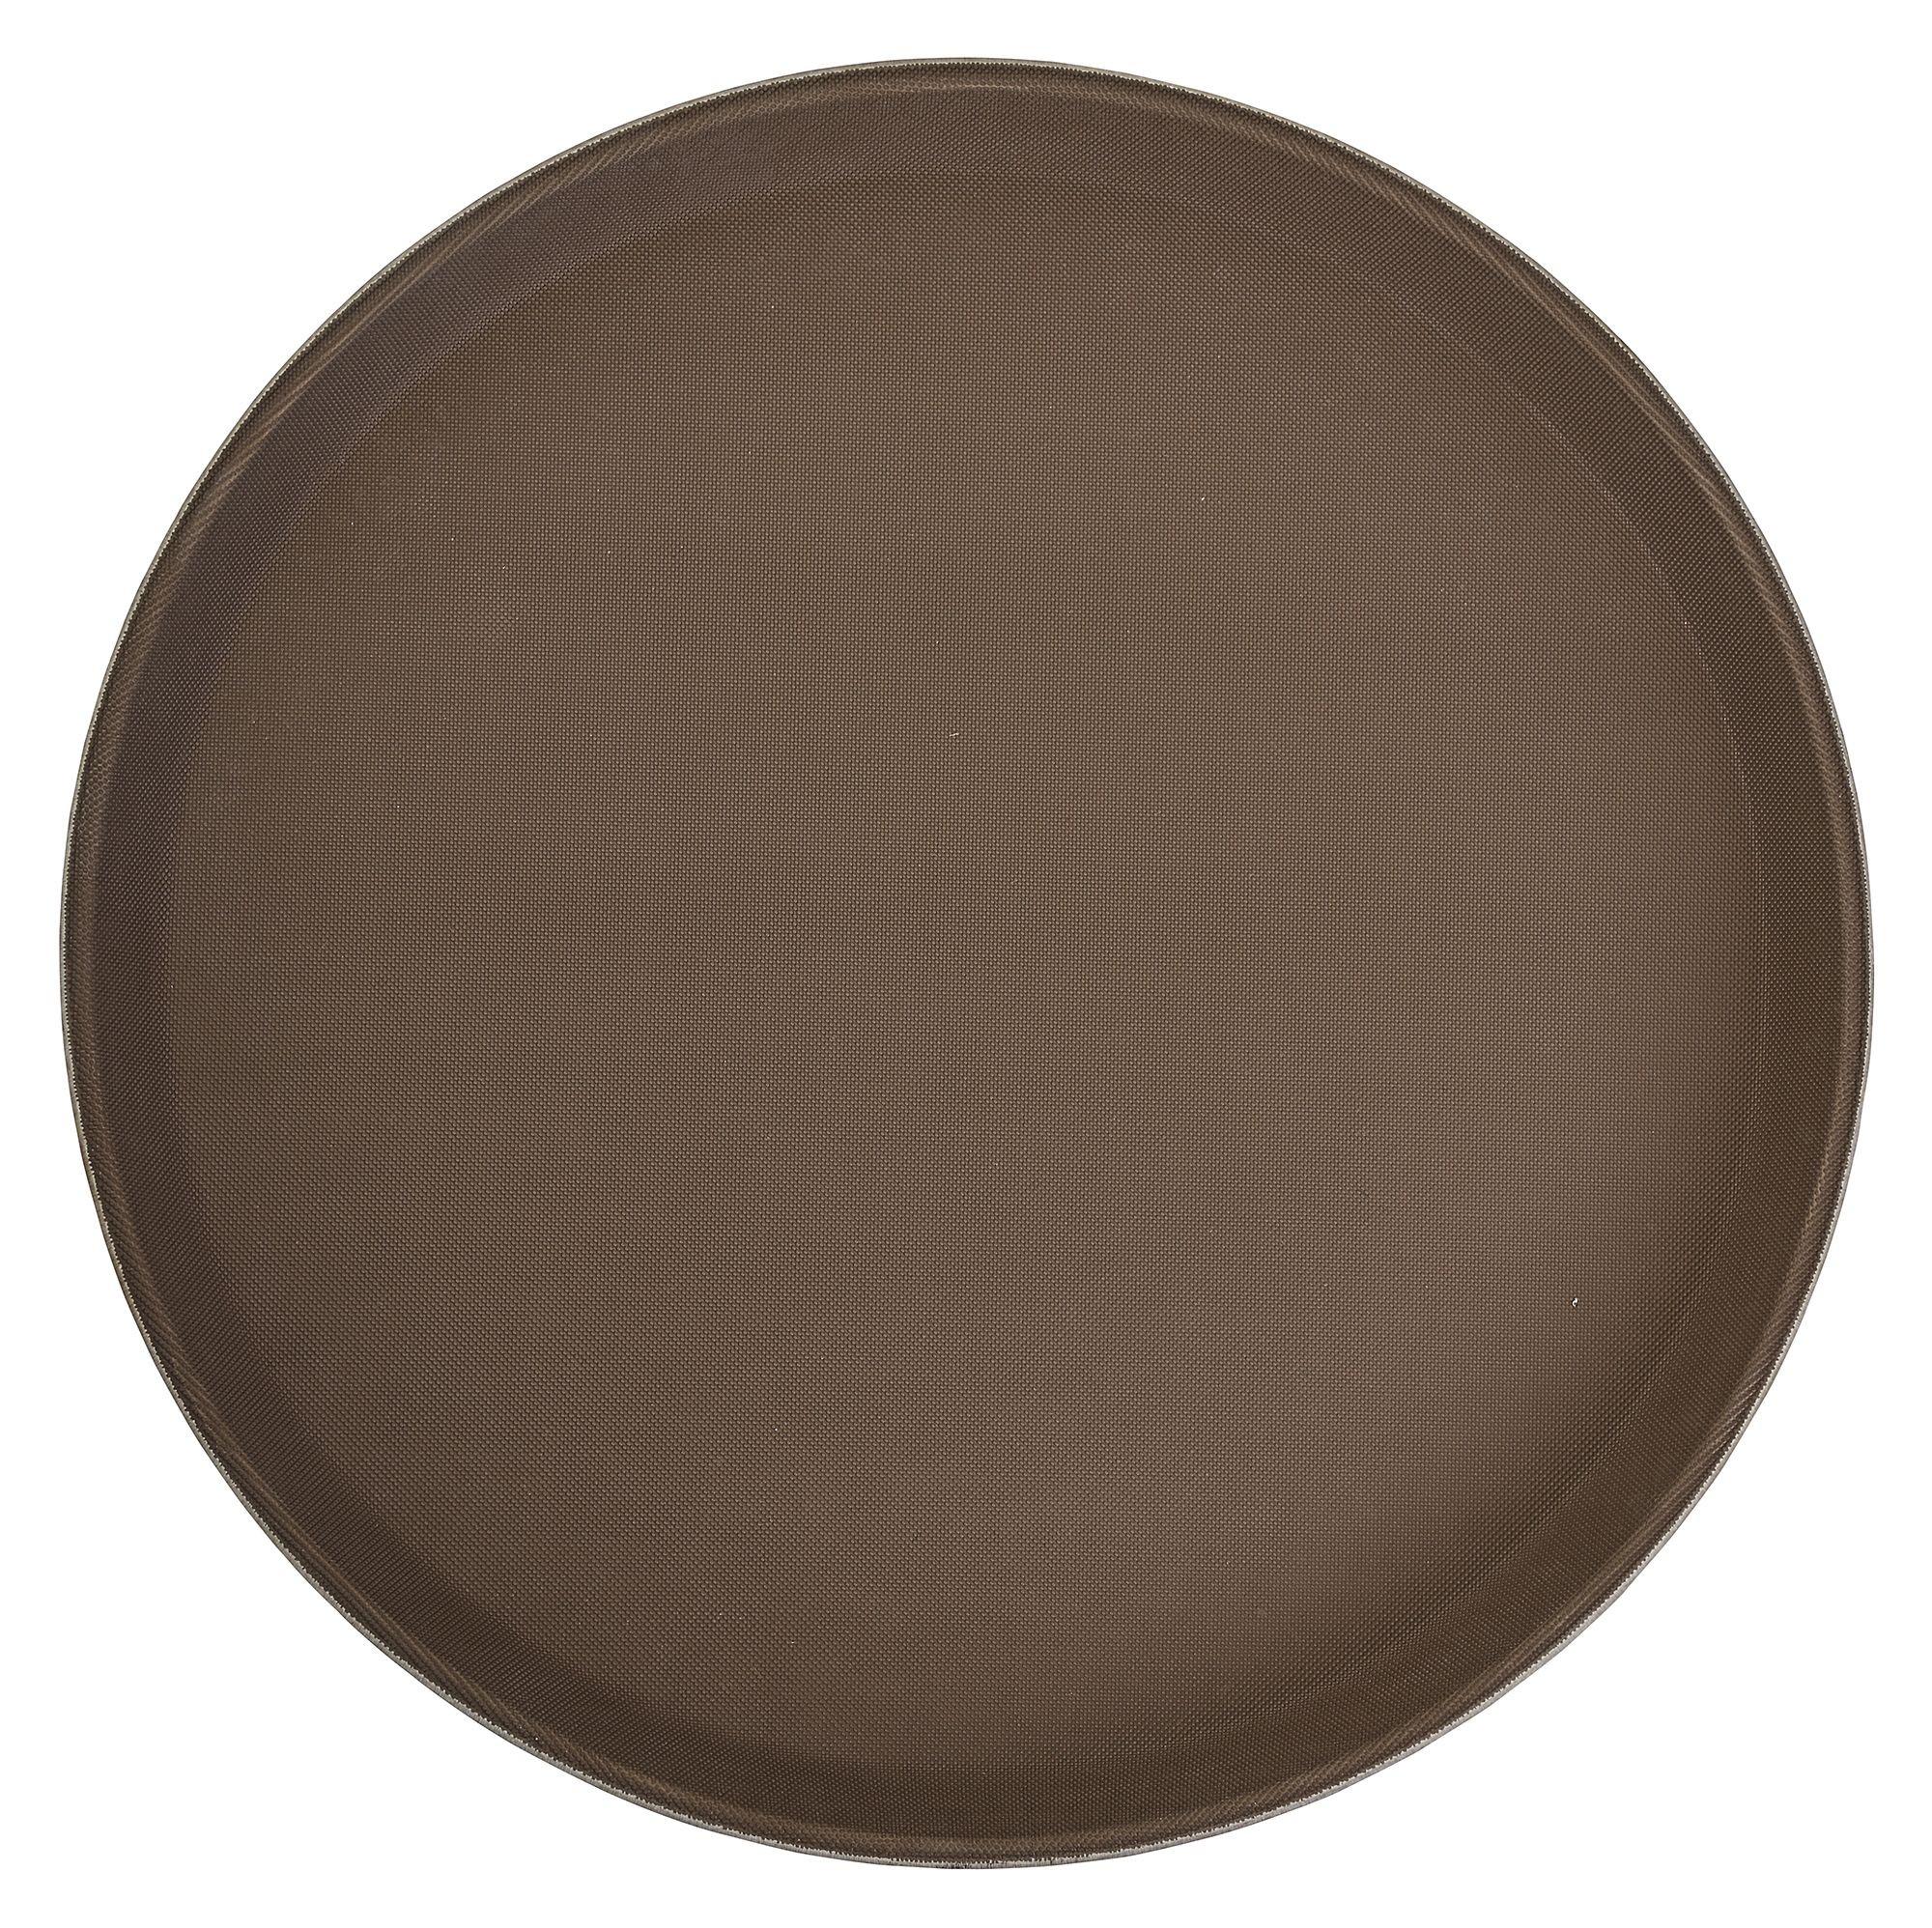 Winco TFG-16N Brown Round Non-Slip Fiberglass Tray 16''